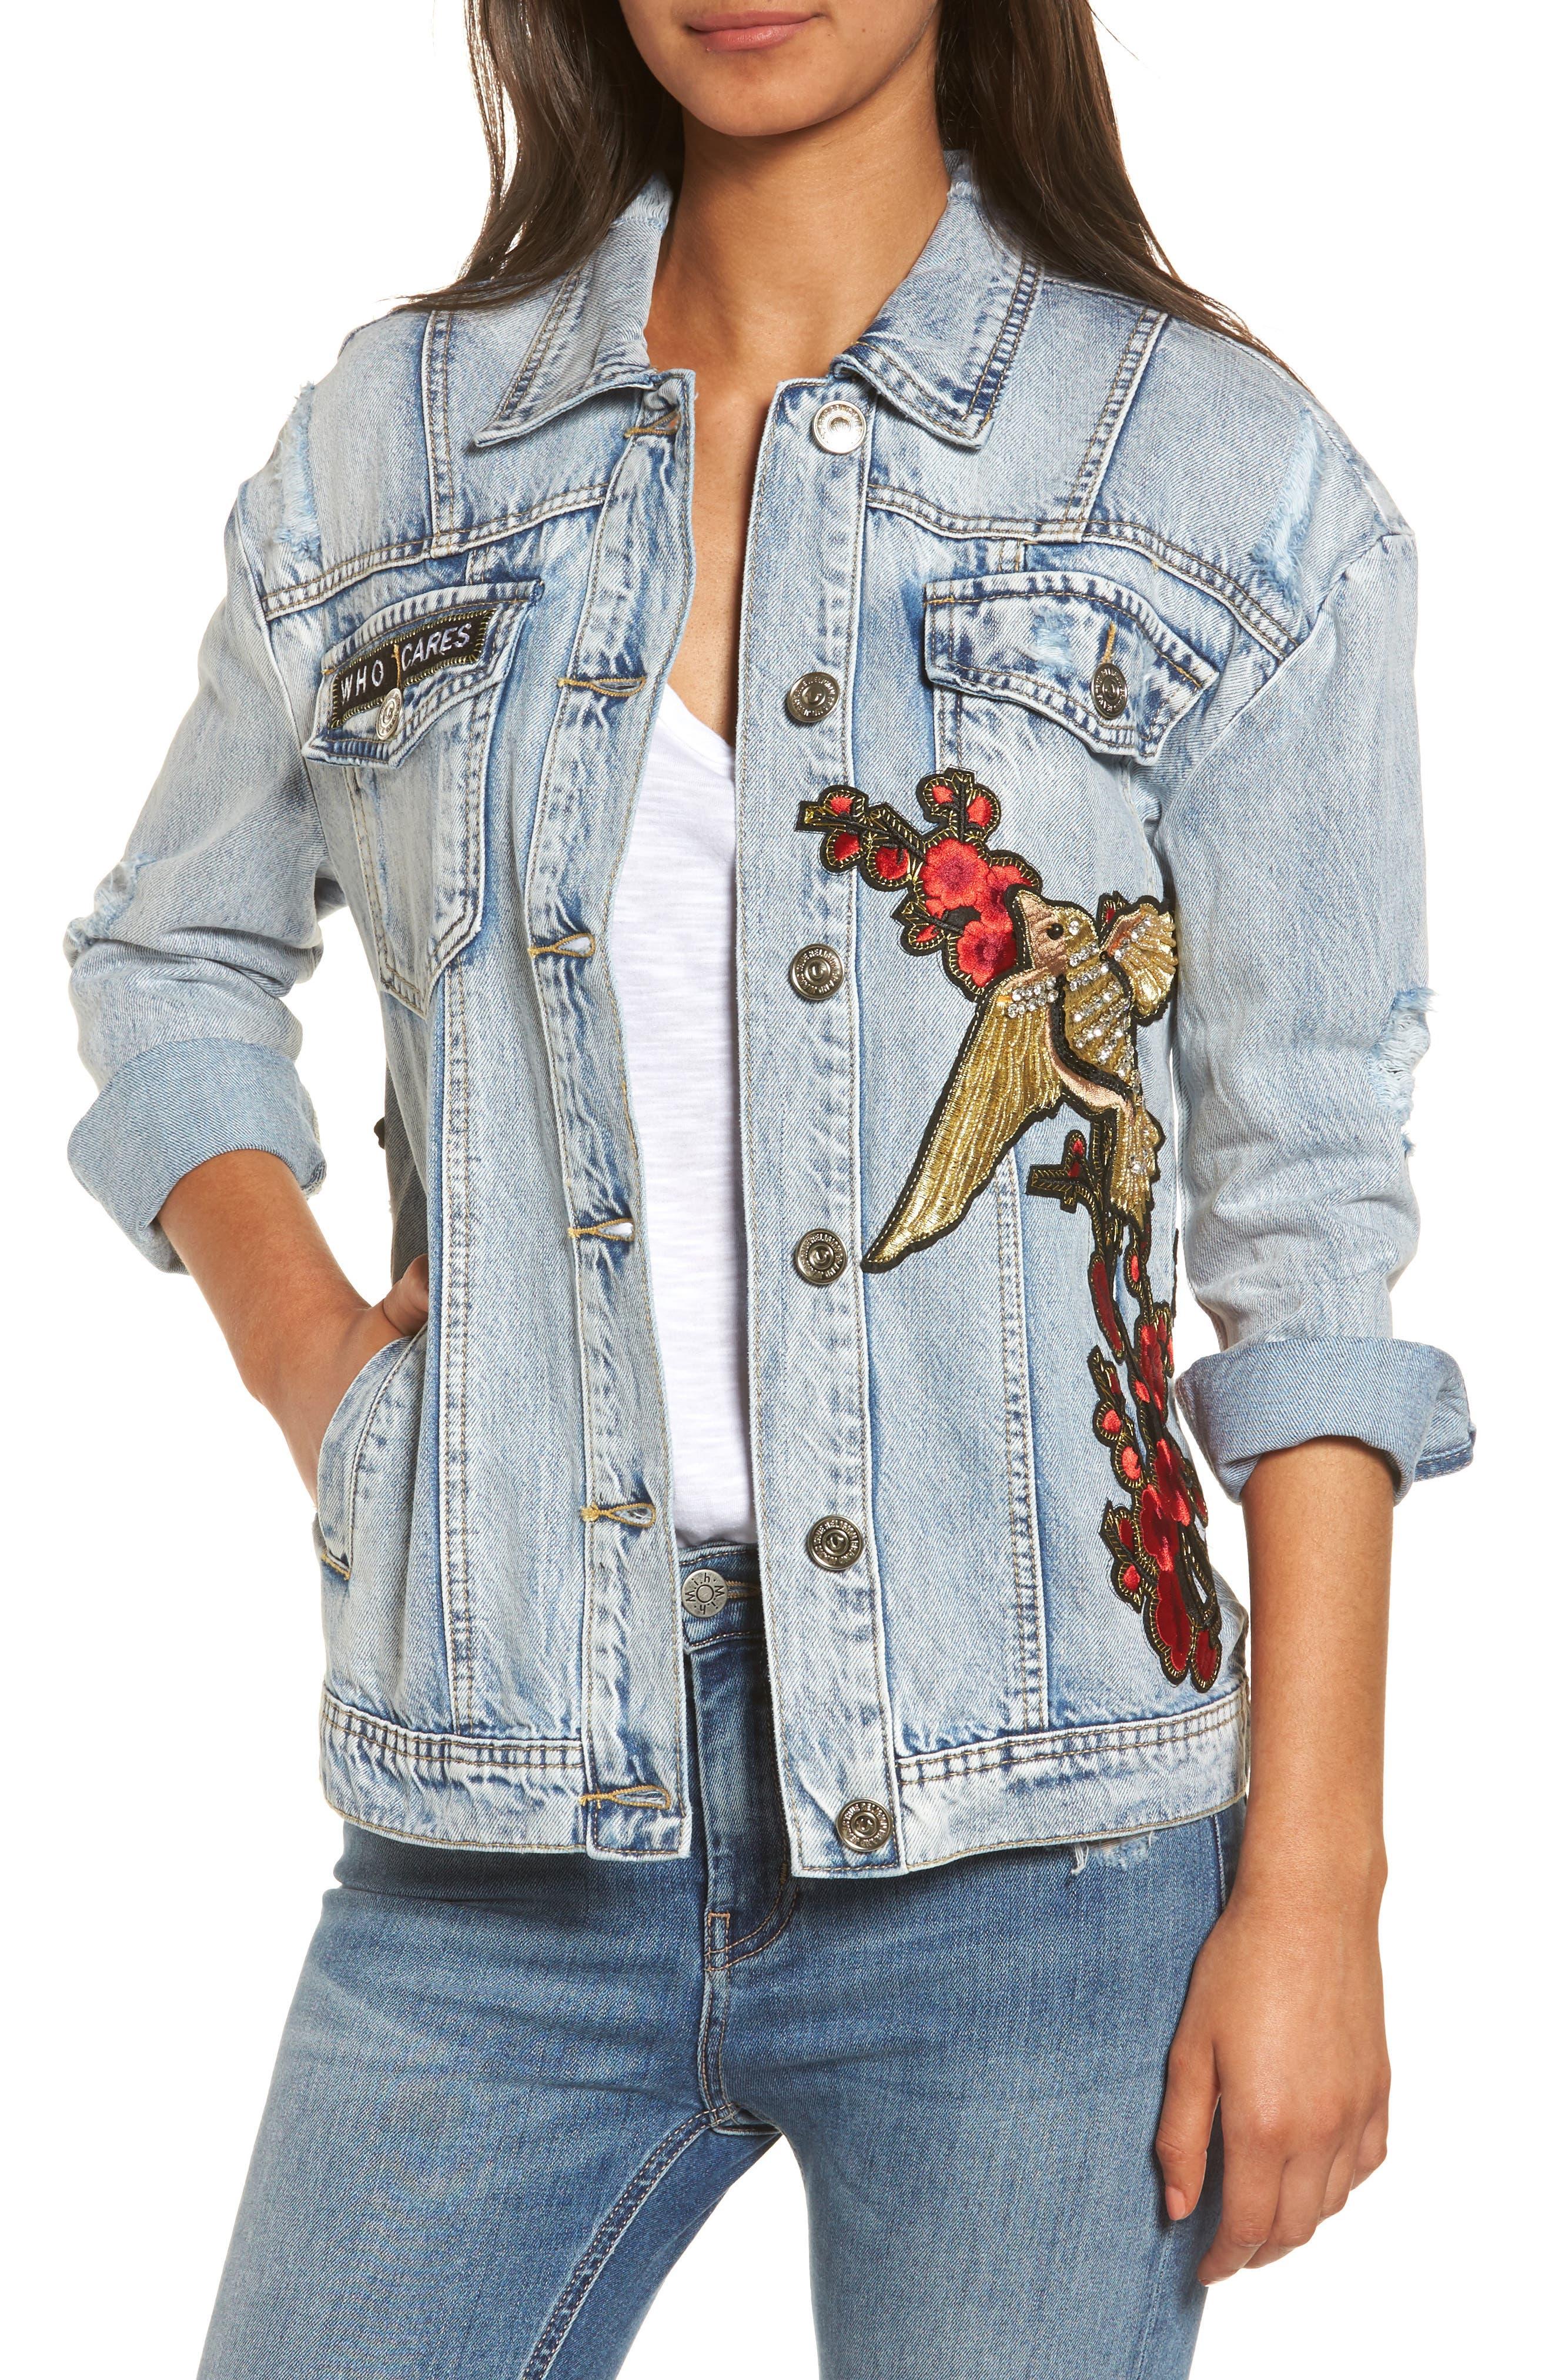 Main Image - True Religion Brand Jeans Denim Trucker Jacket